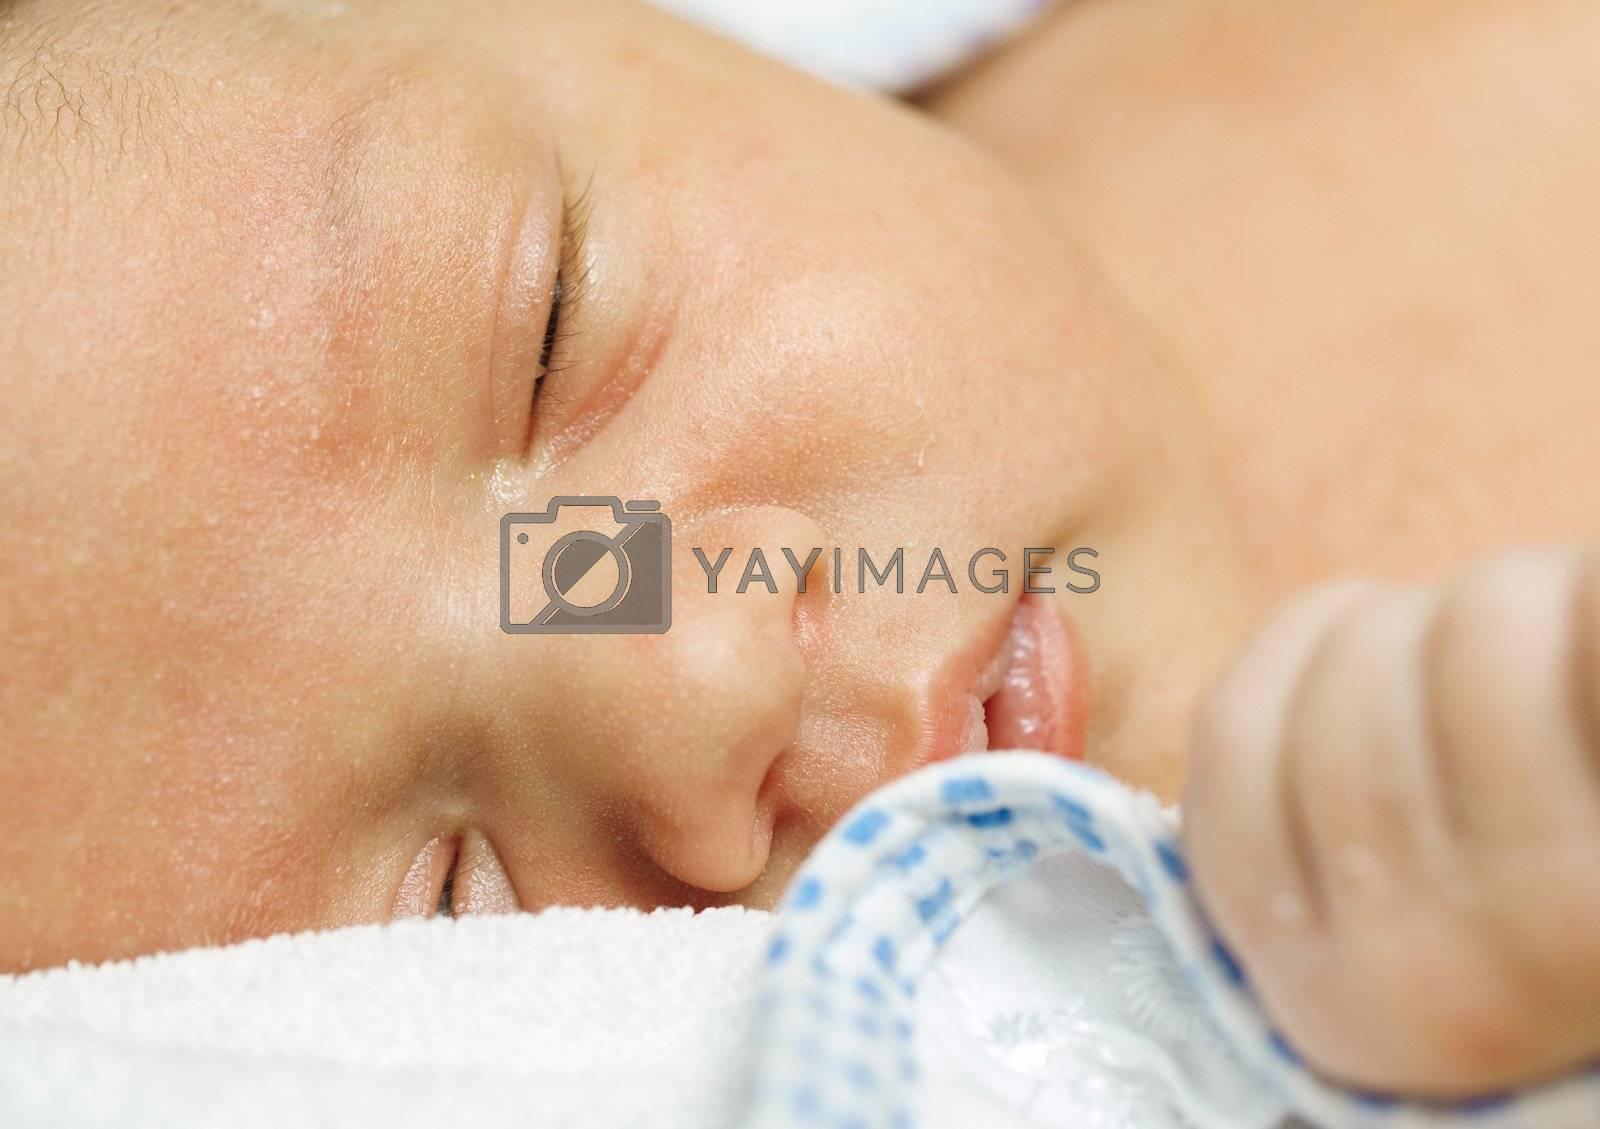 new-born baby sleeping on a towel